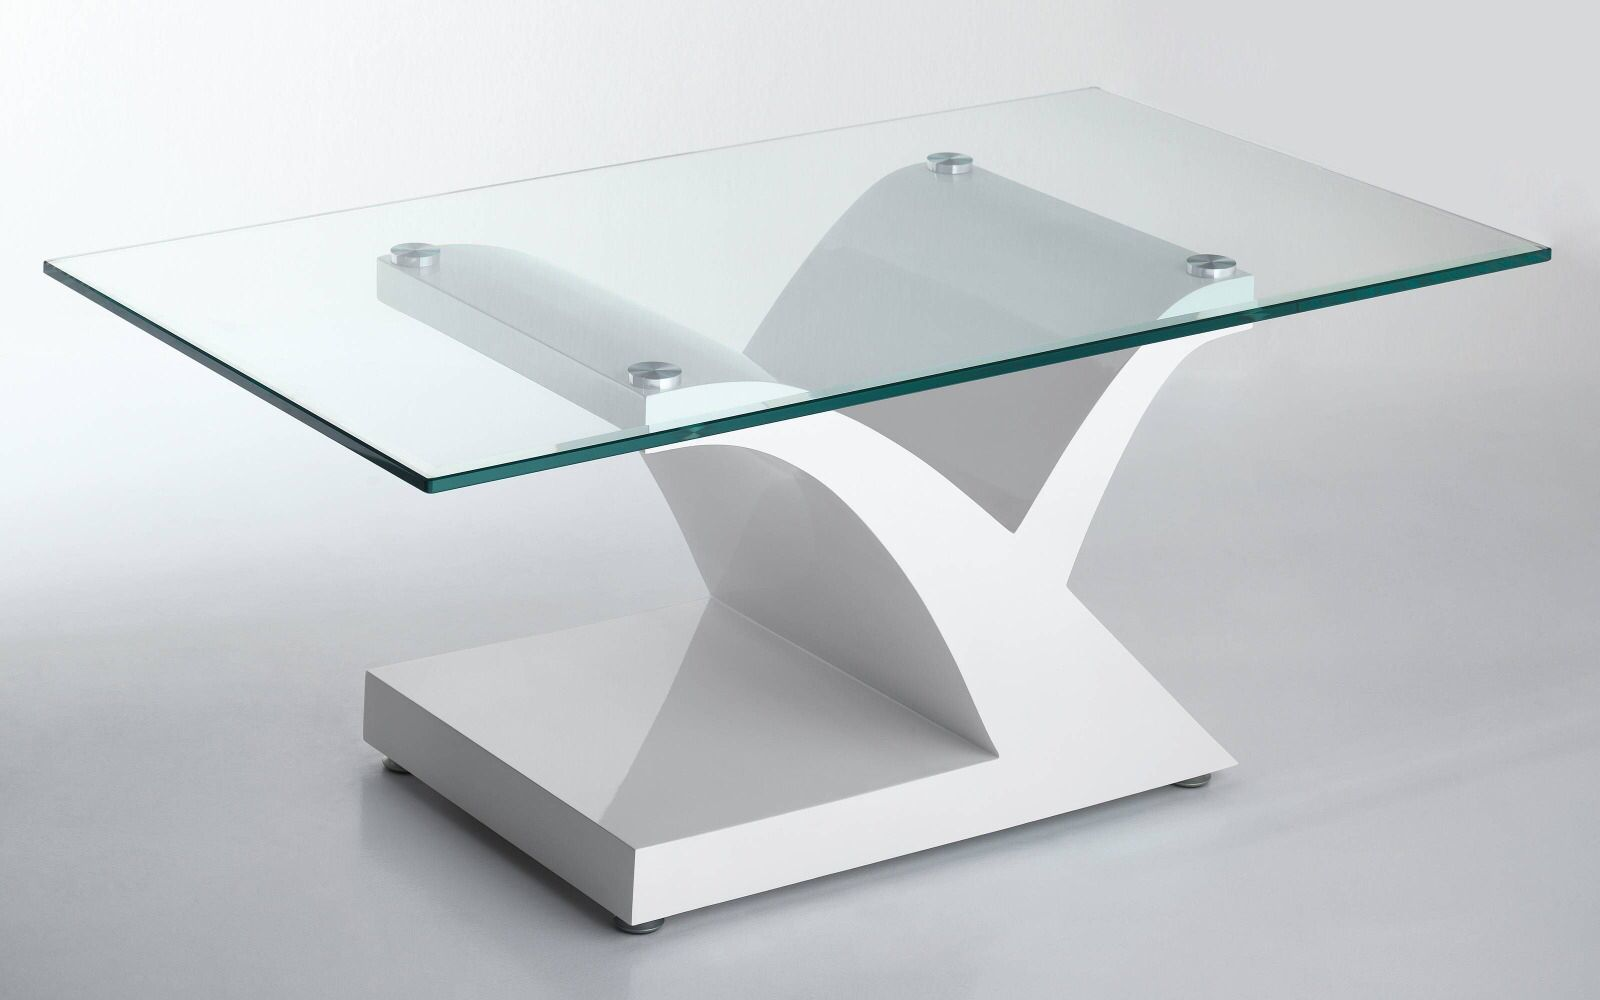 Tavolo Vetro Mondo Convenienza.Tavolini Mondo Convenienza Tavolo Tavolini Tavolo Vetro